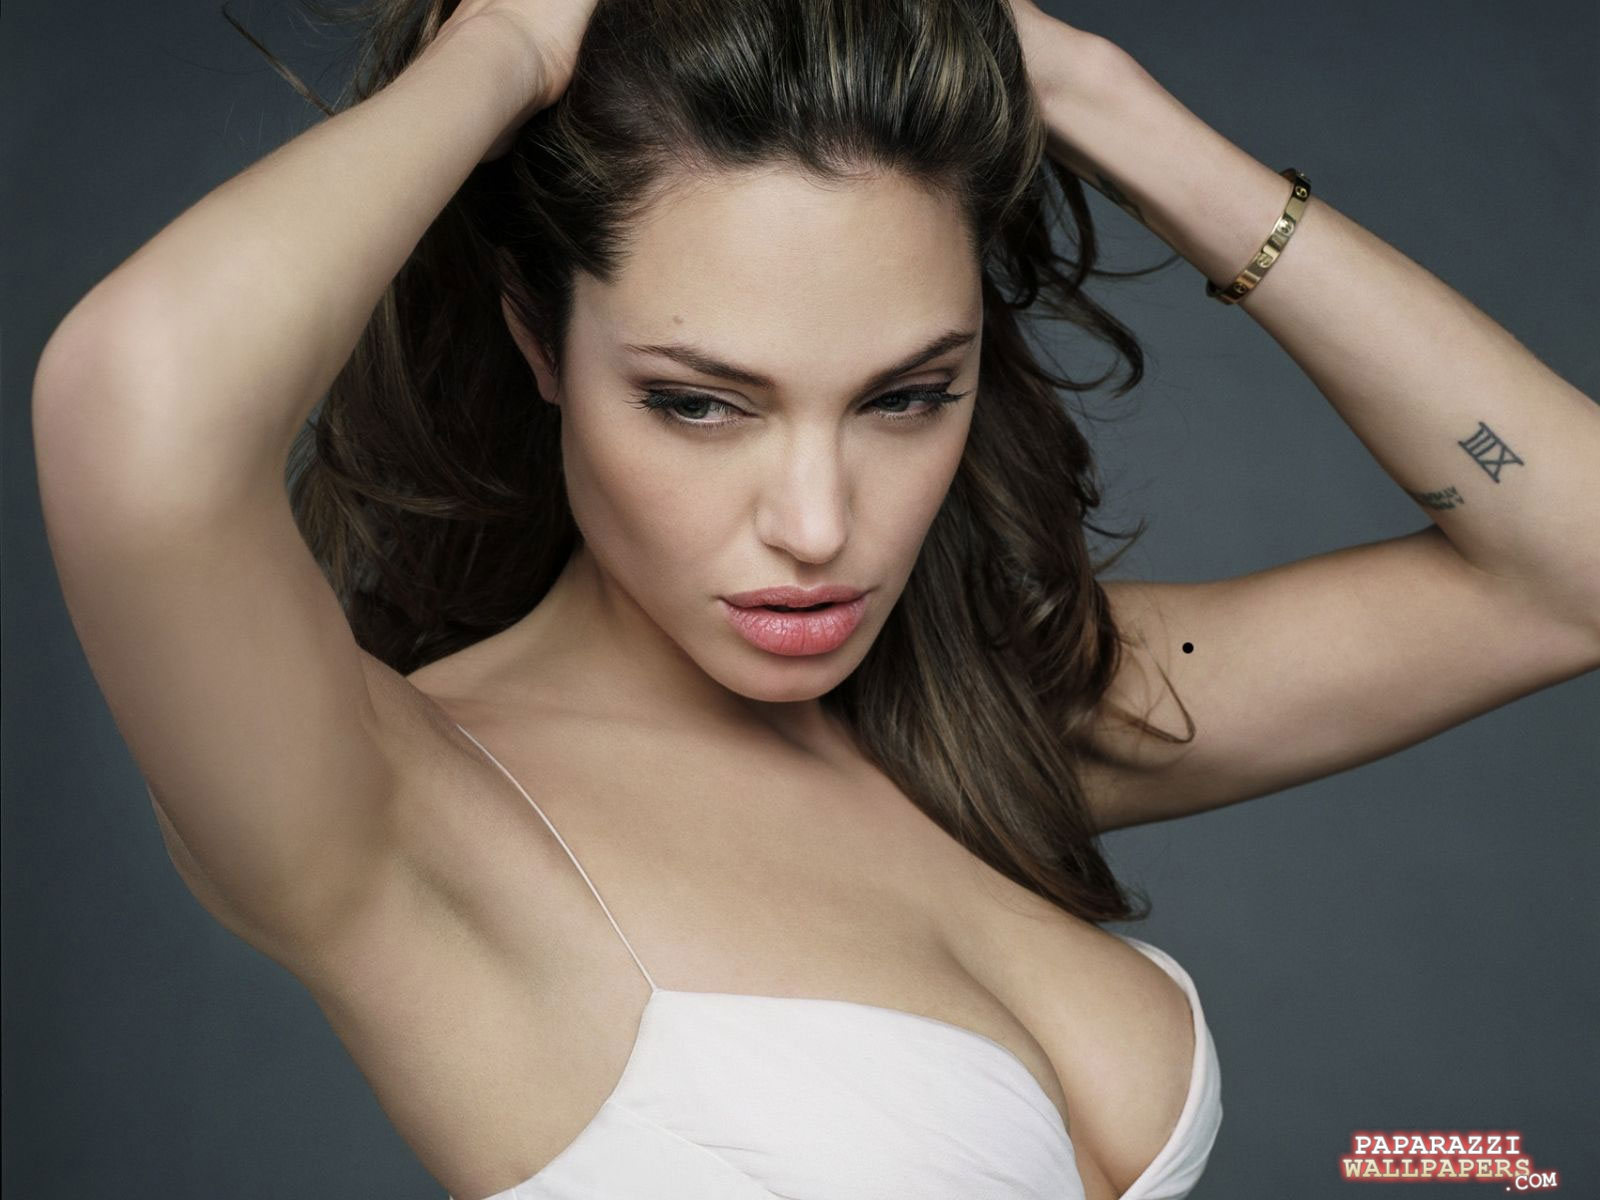 http://2.bp.blogspot.com/-ABqVcseVPHA/T8KFo8MxF8I/AAAAAAAAAEw/2dwA5F52Rdc/s1600/Angelina+Jolie11.jpg